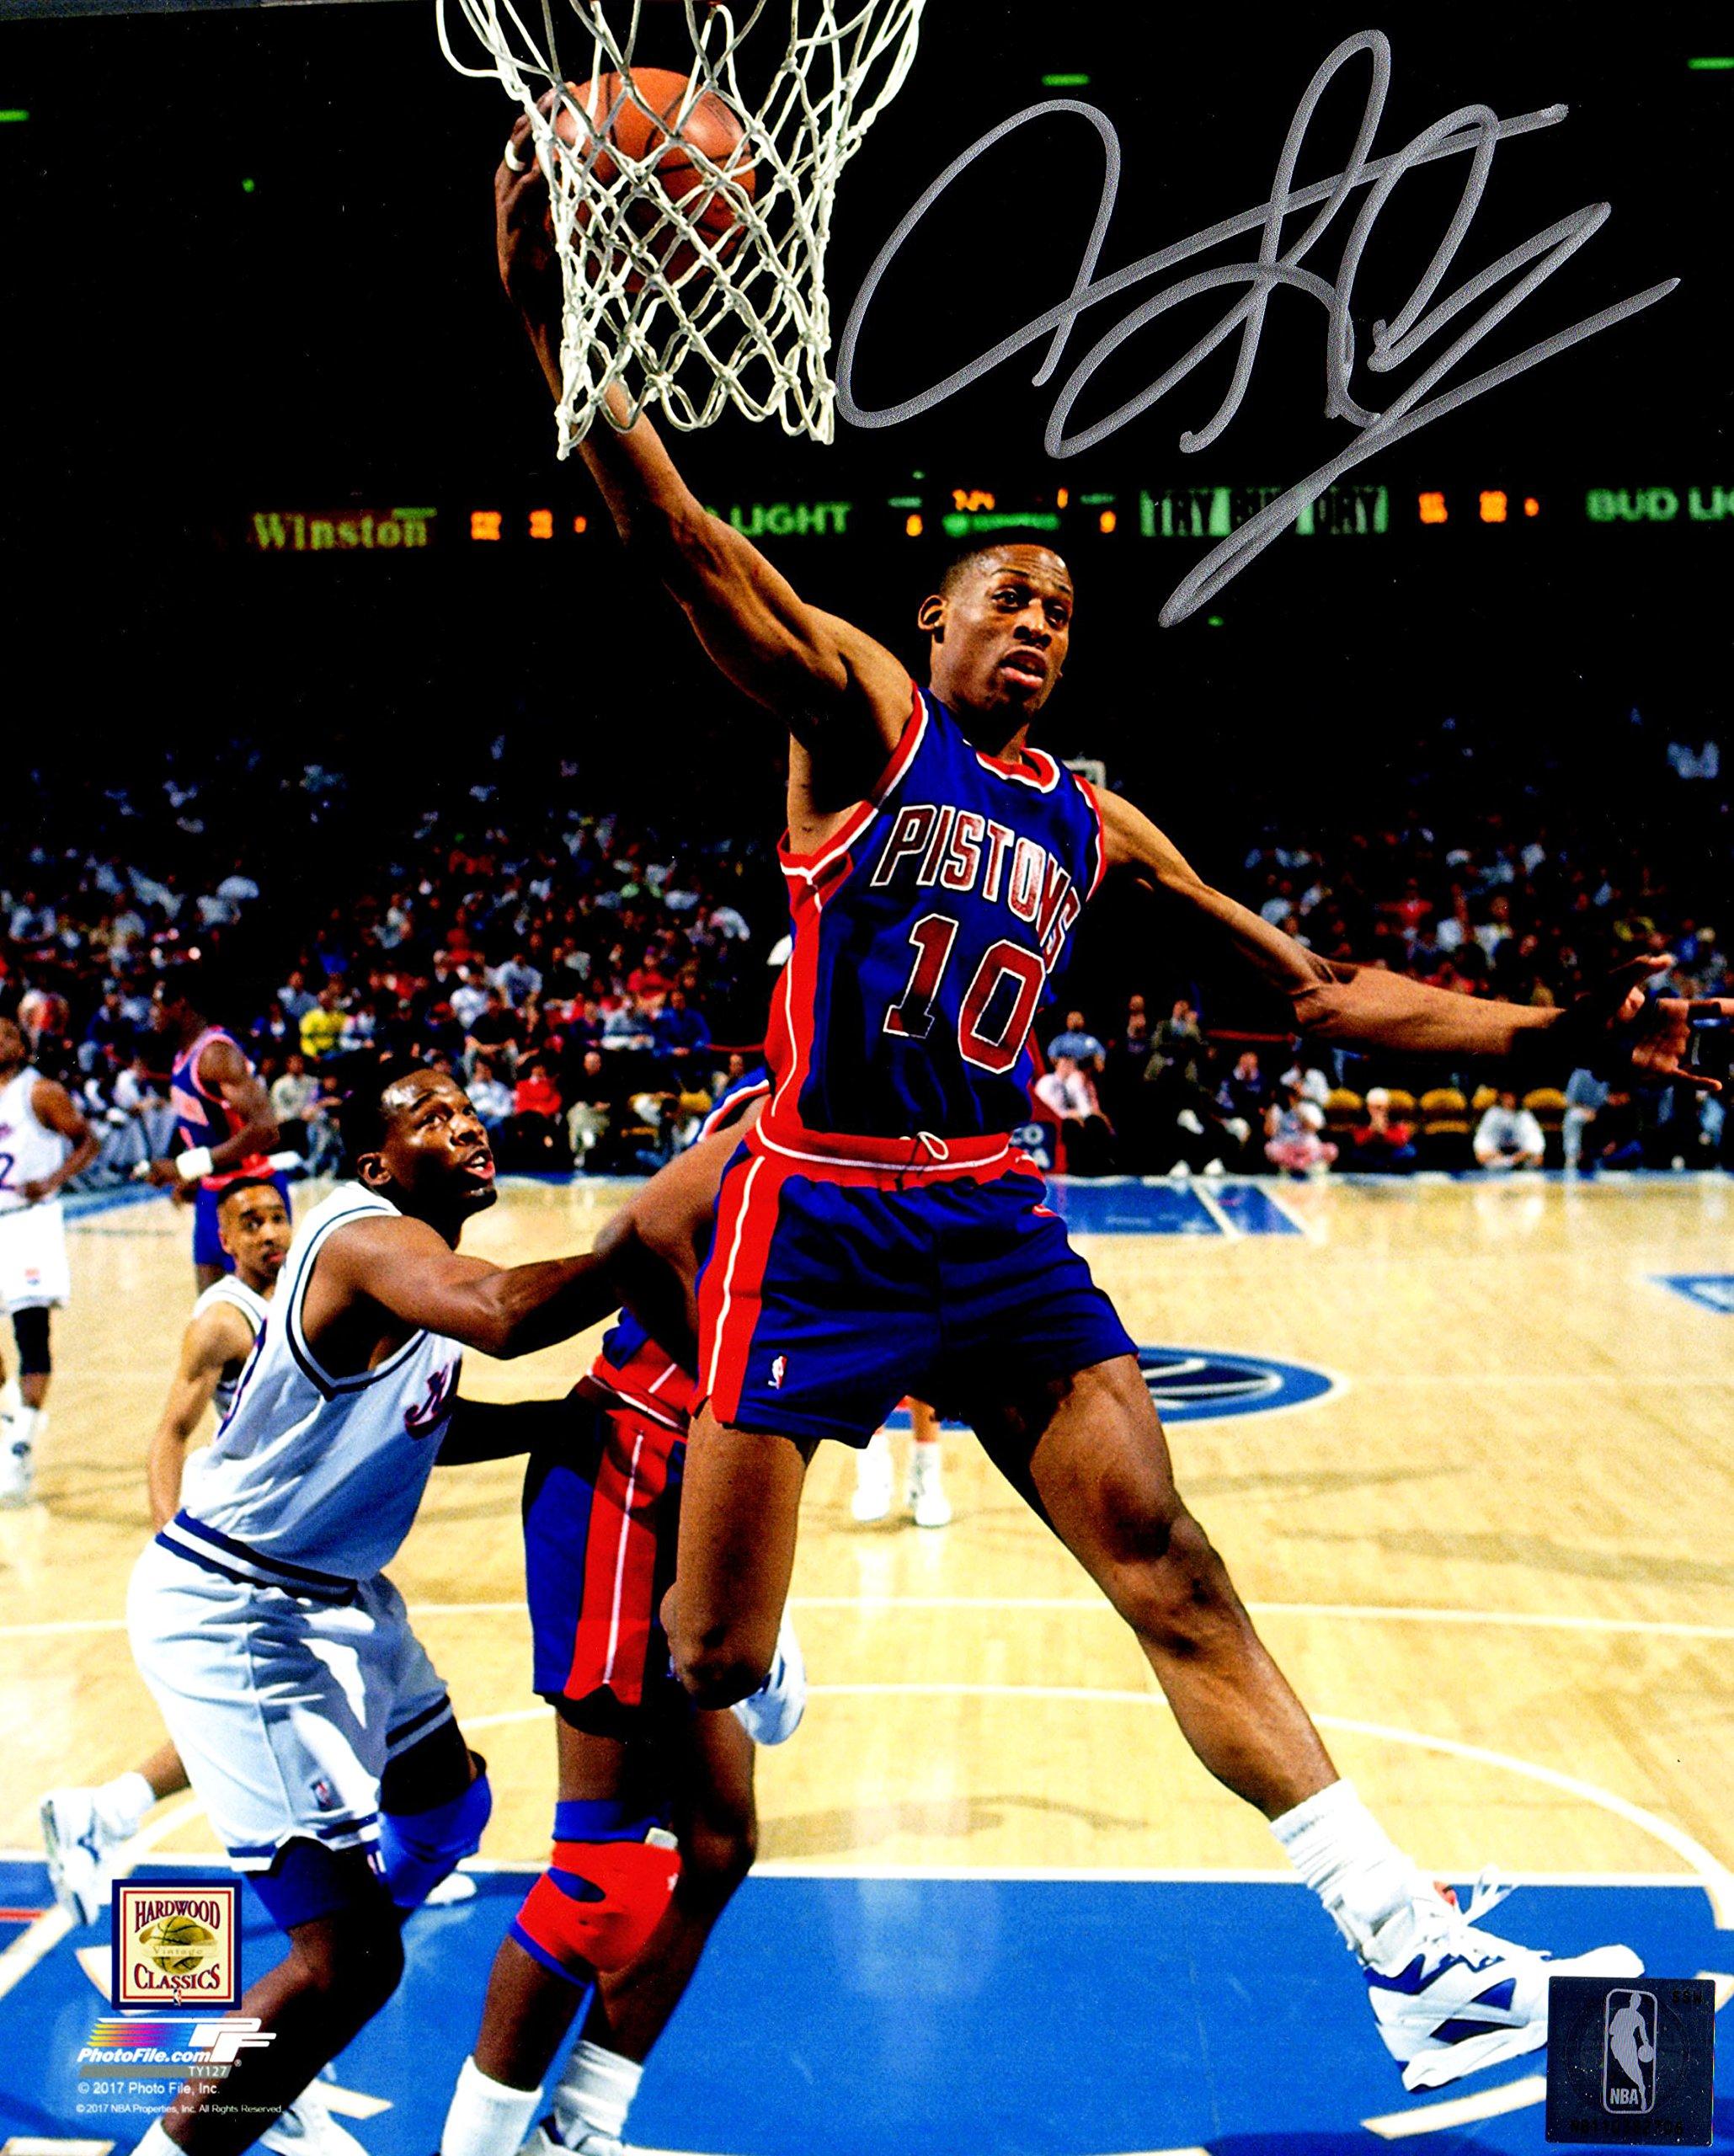 Dennis Rodman Signed Detroit Pistons Rebound Action 8x10 Photo